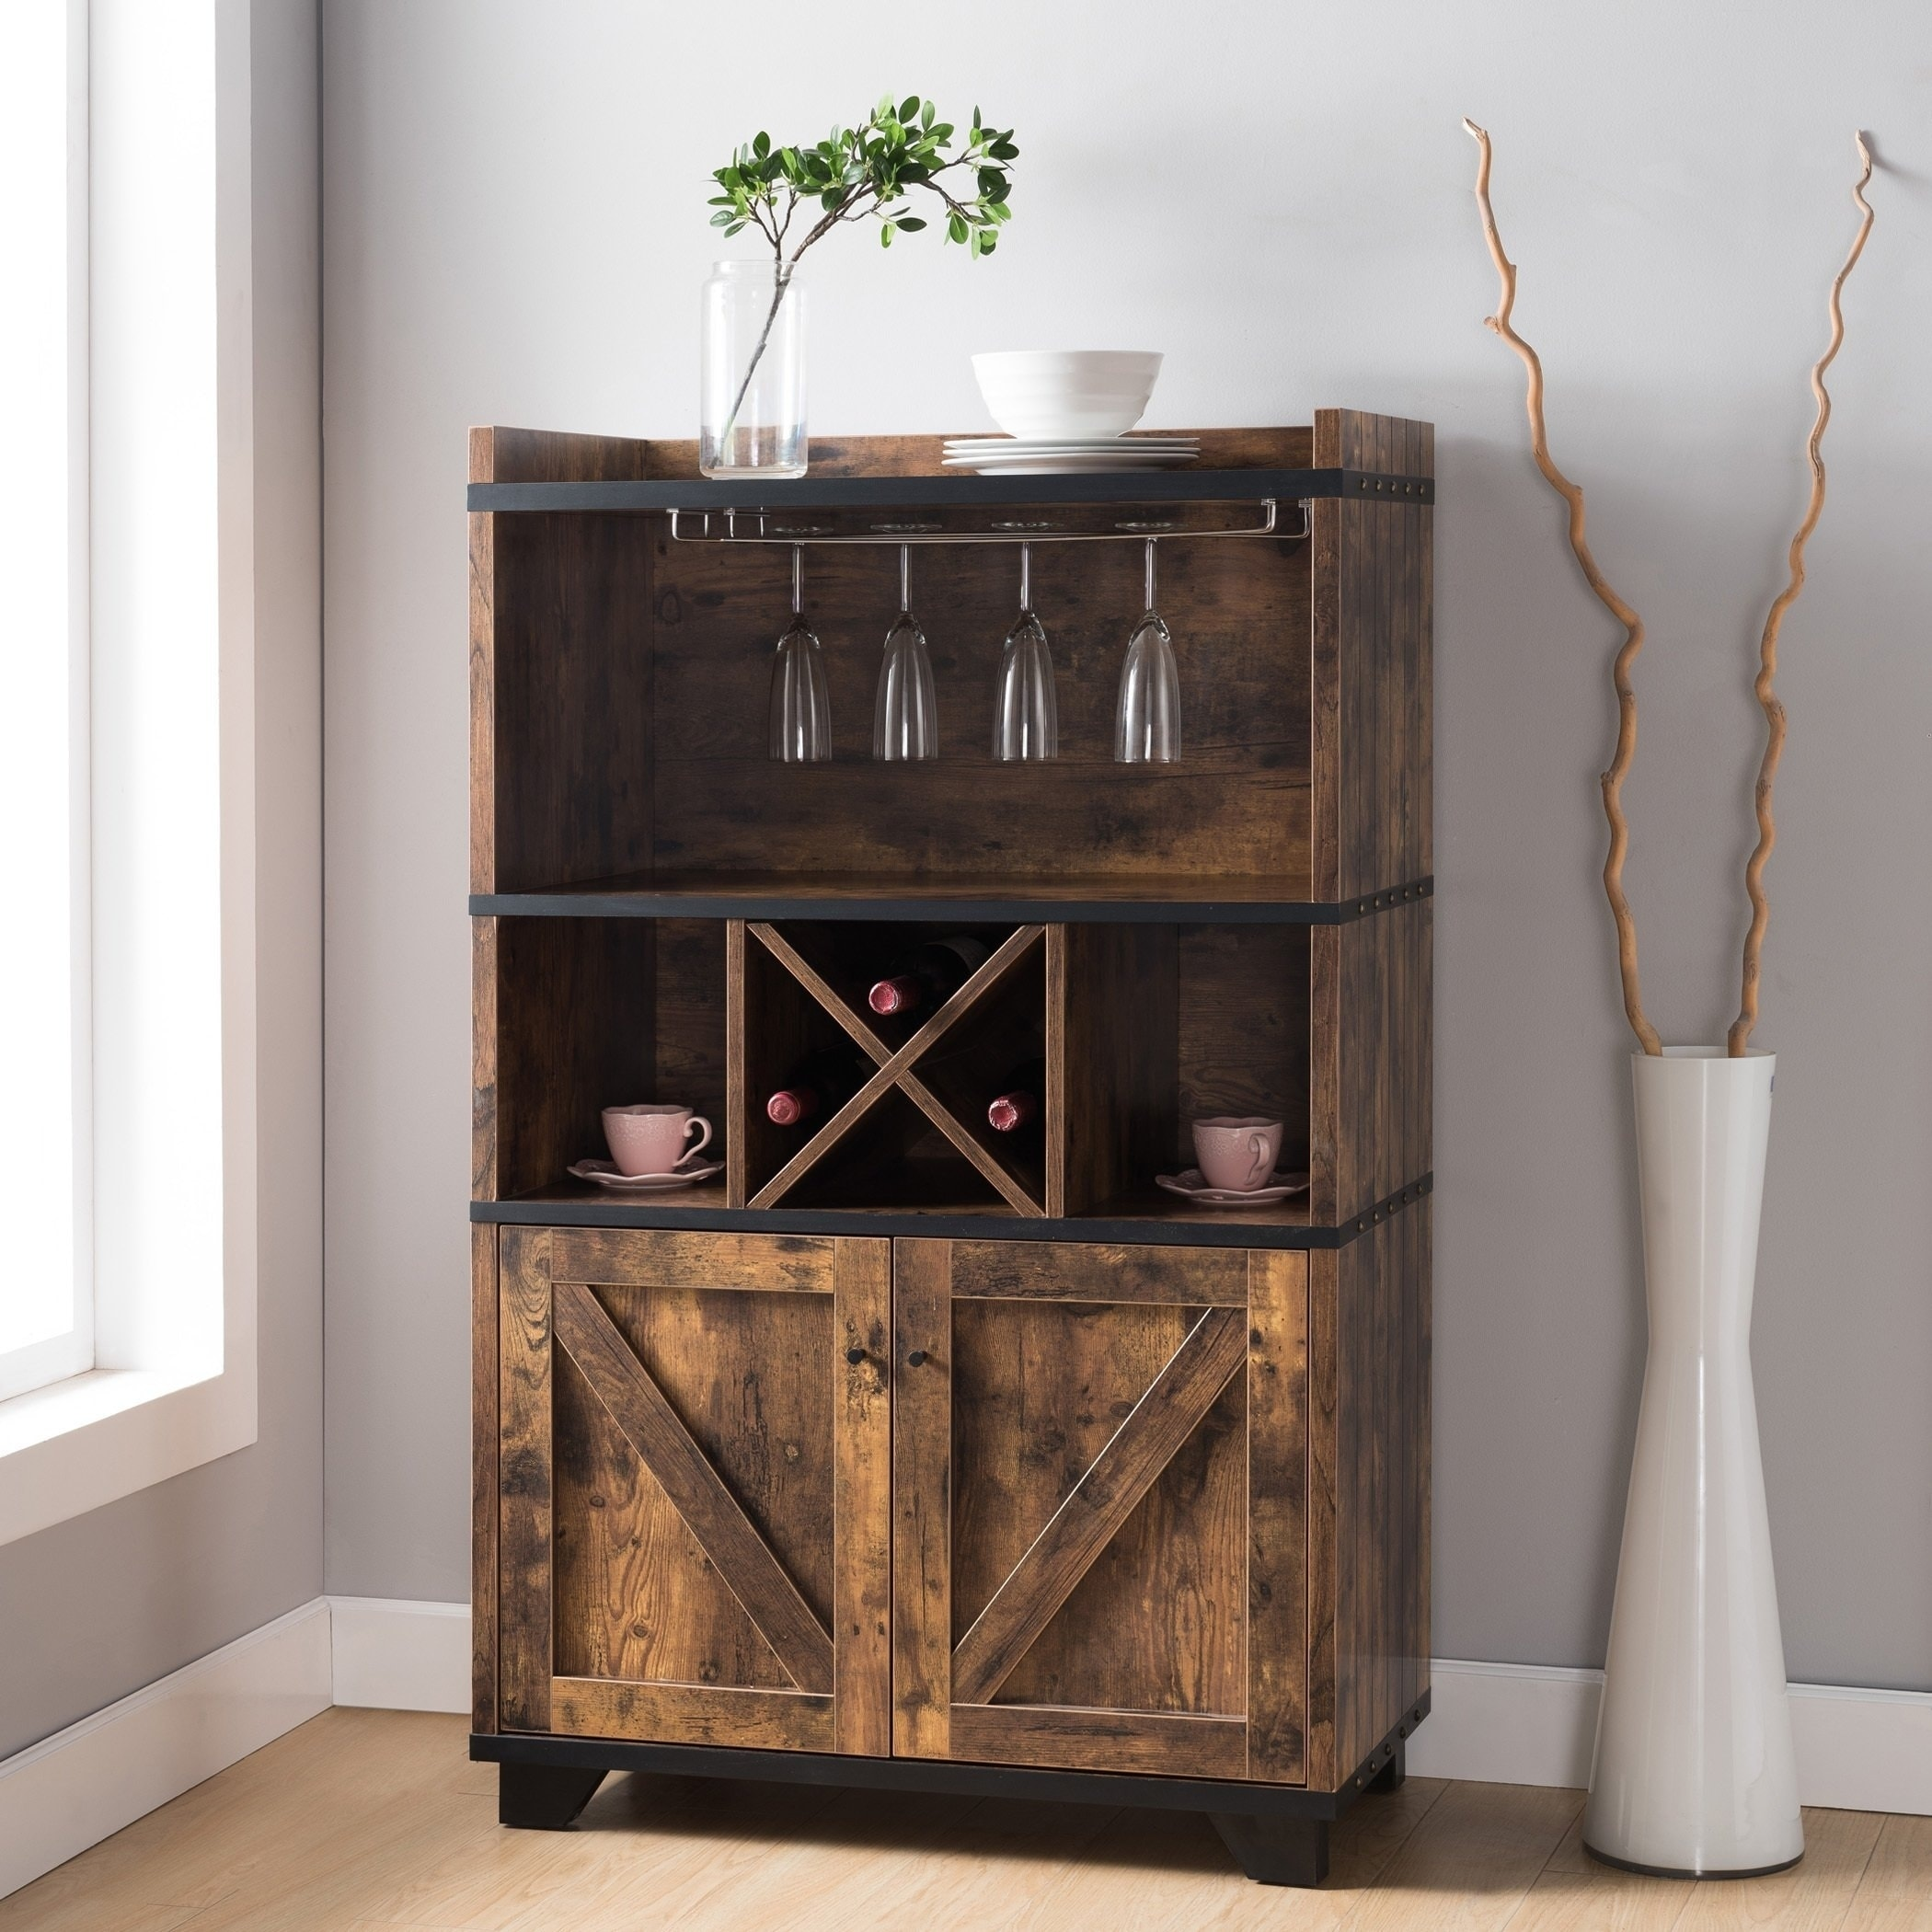 Furniture Of America Keya Farmhouse 31 Inch Wine Cabinet Buffet